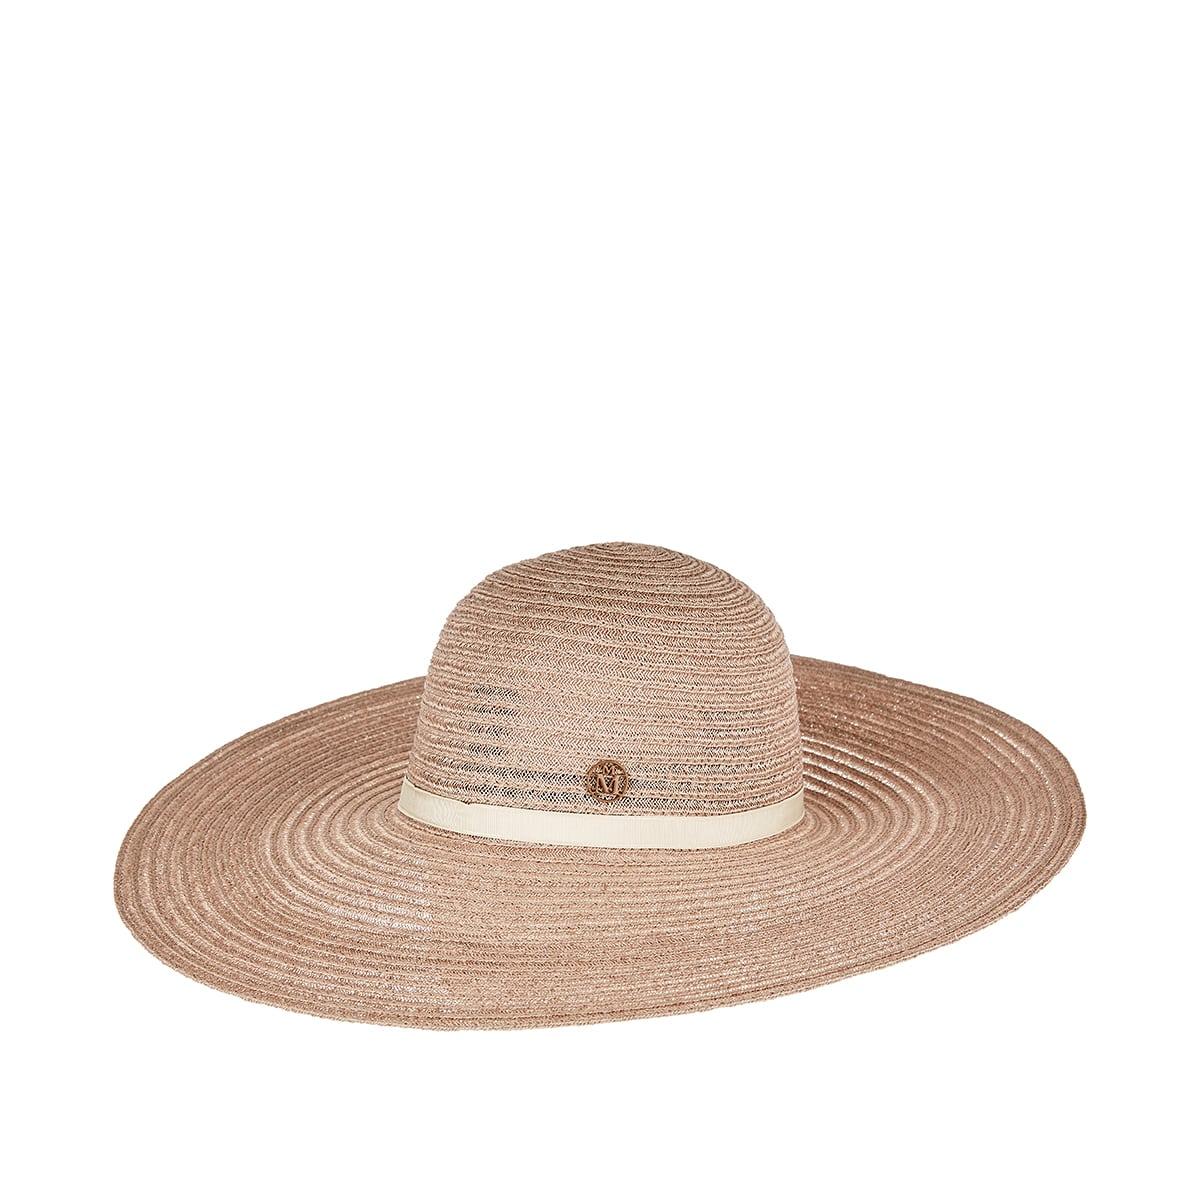 Blanche wide-brim woven hat